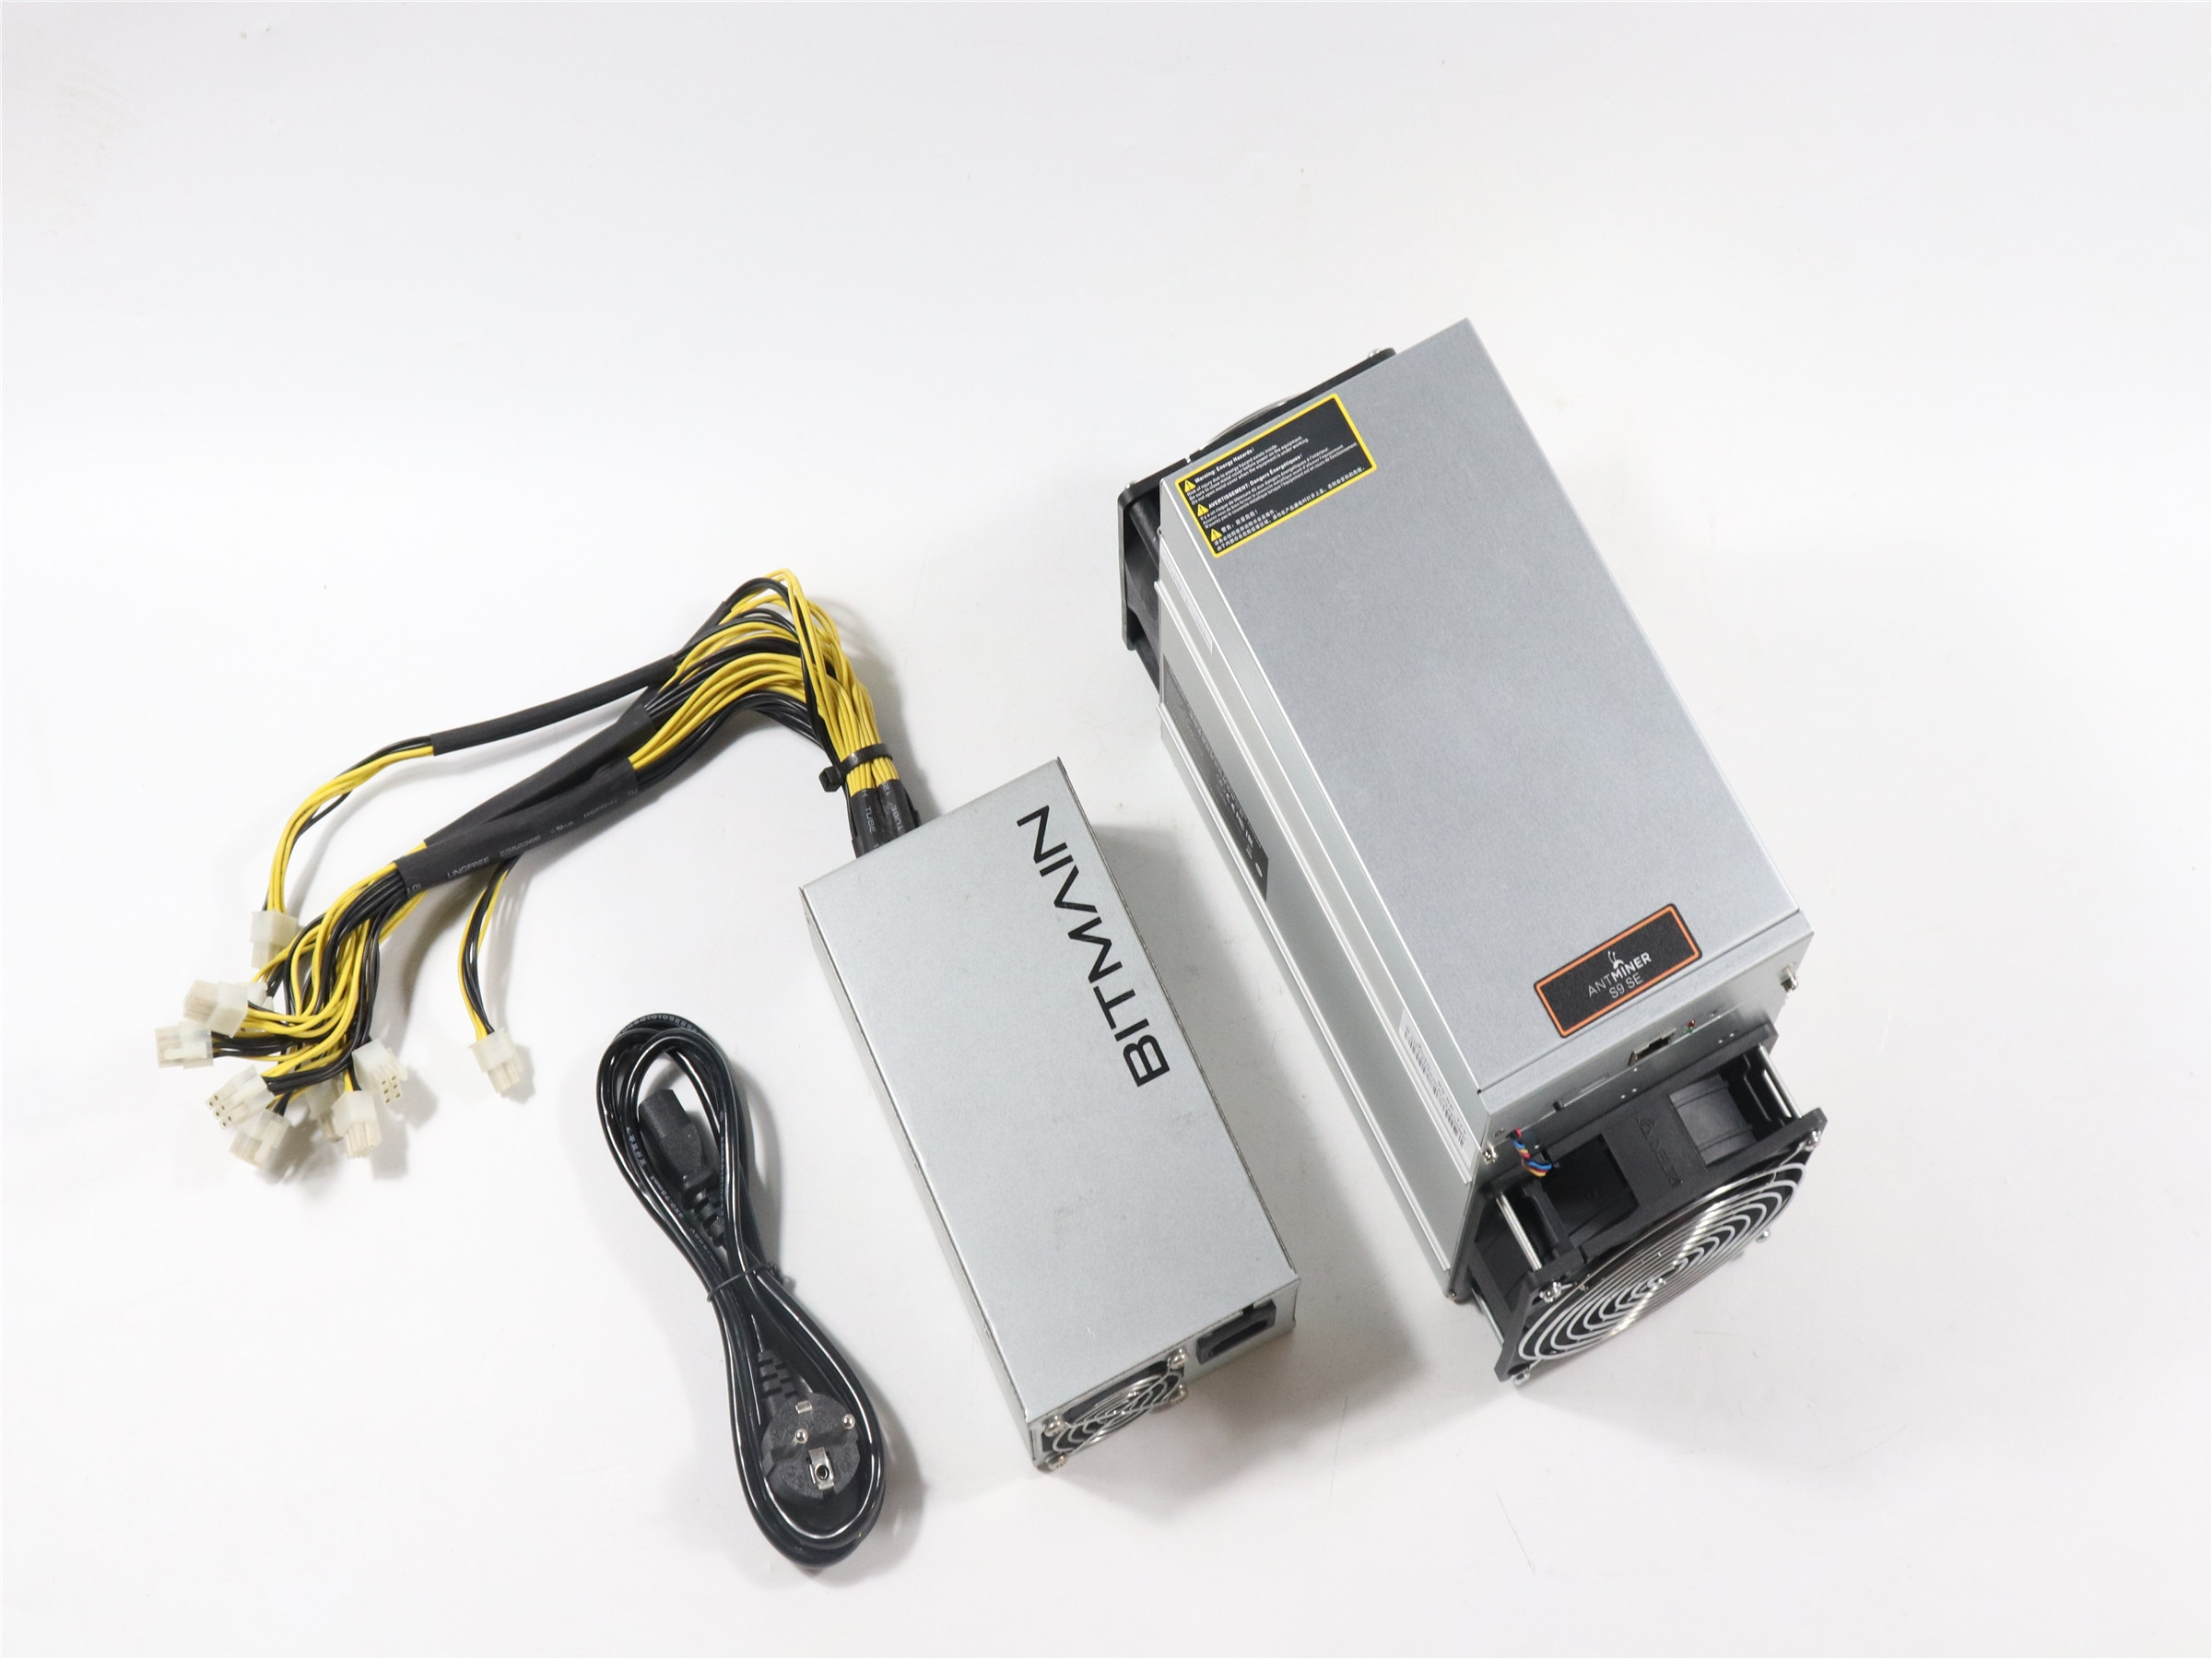 BITMAIN-AntMiner S9 SE 17TH/S مع مصدر طاقة ، جهاز تعدين BTC BCH أفضل من Antminer S9 13.5t 14t S9k S11 S15 S17 T9 T15 T17